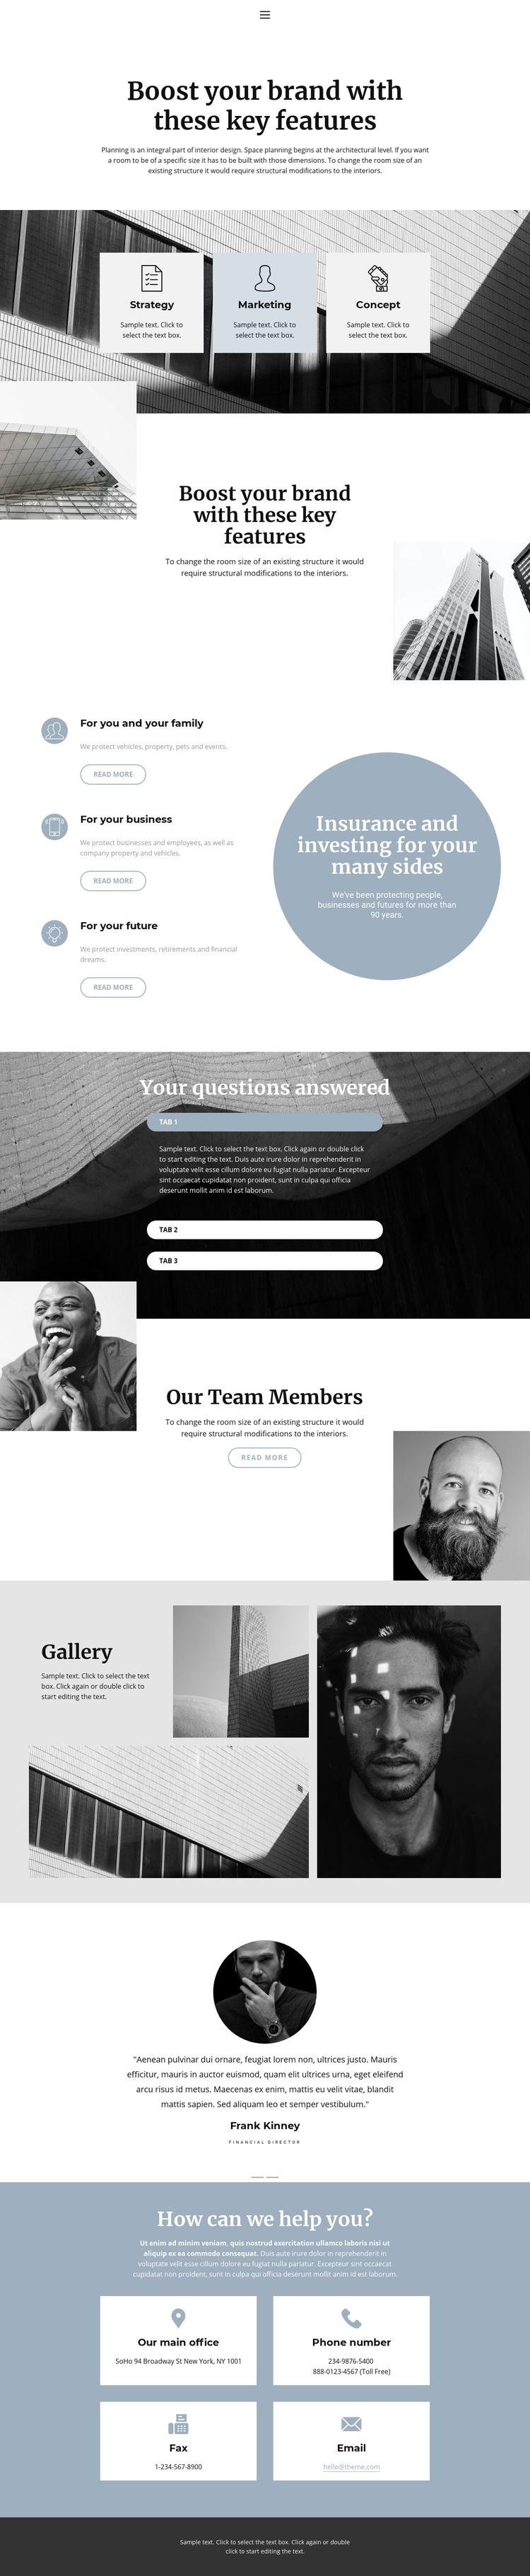 Organization of large business Web Page Design